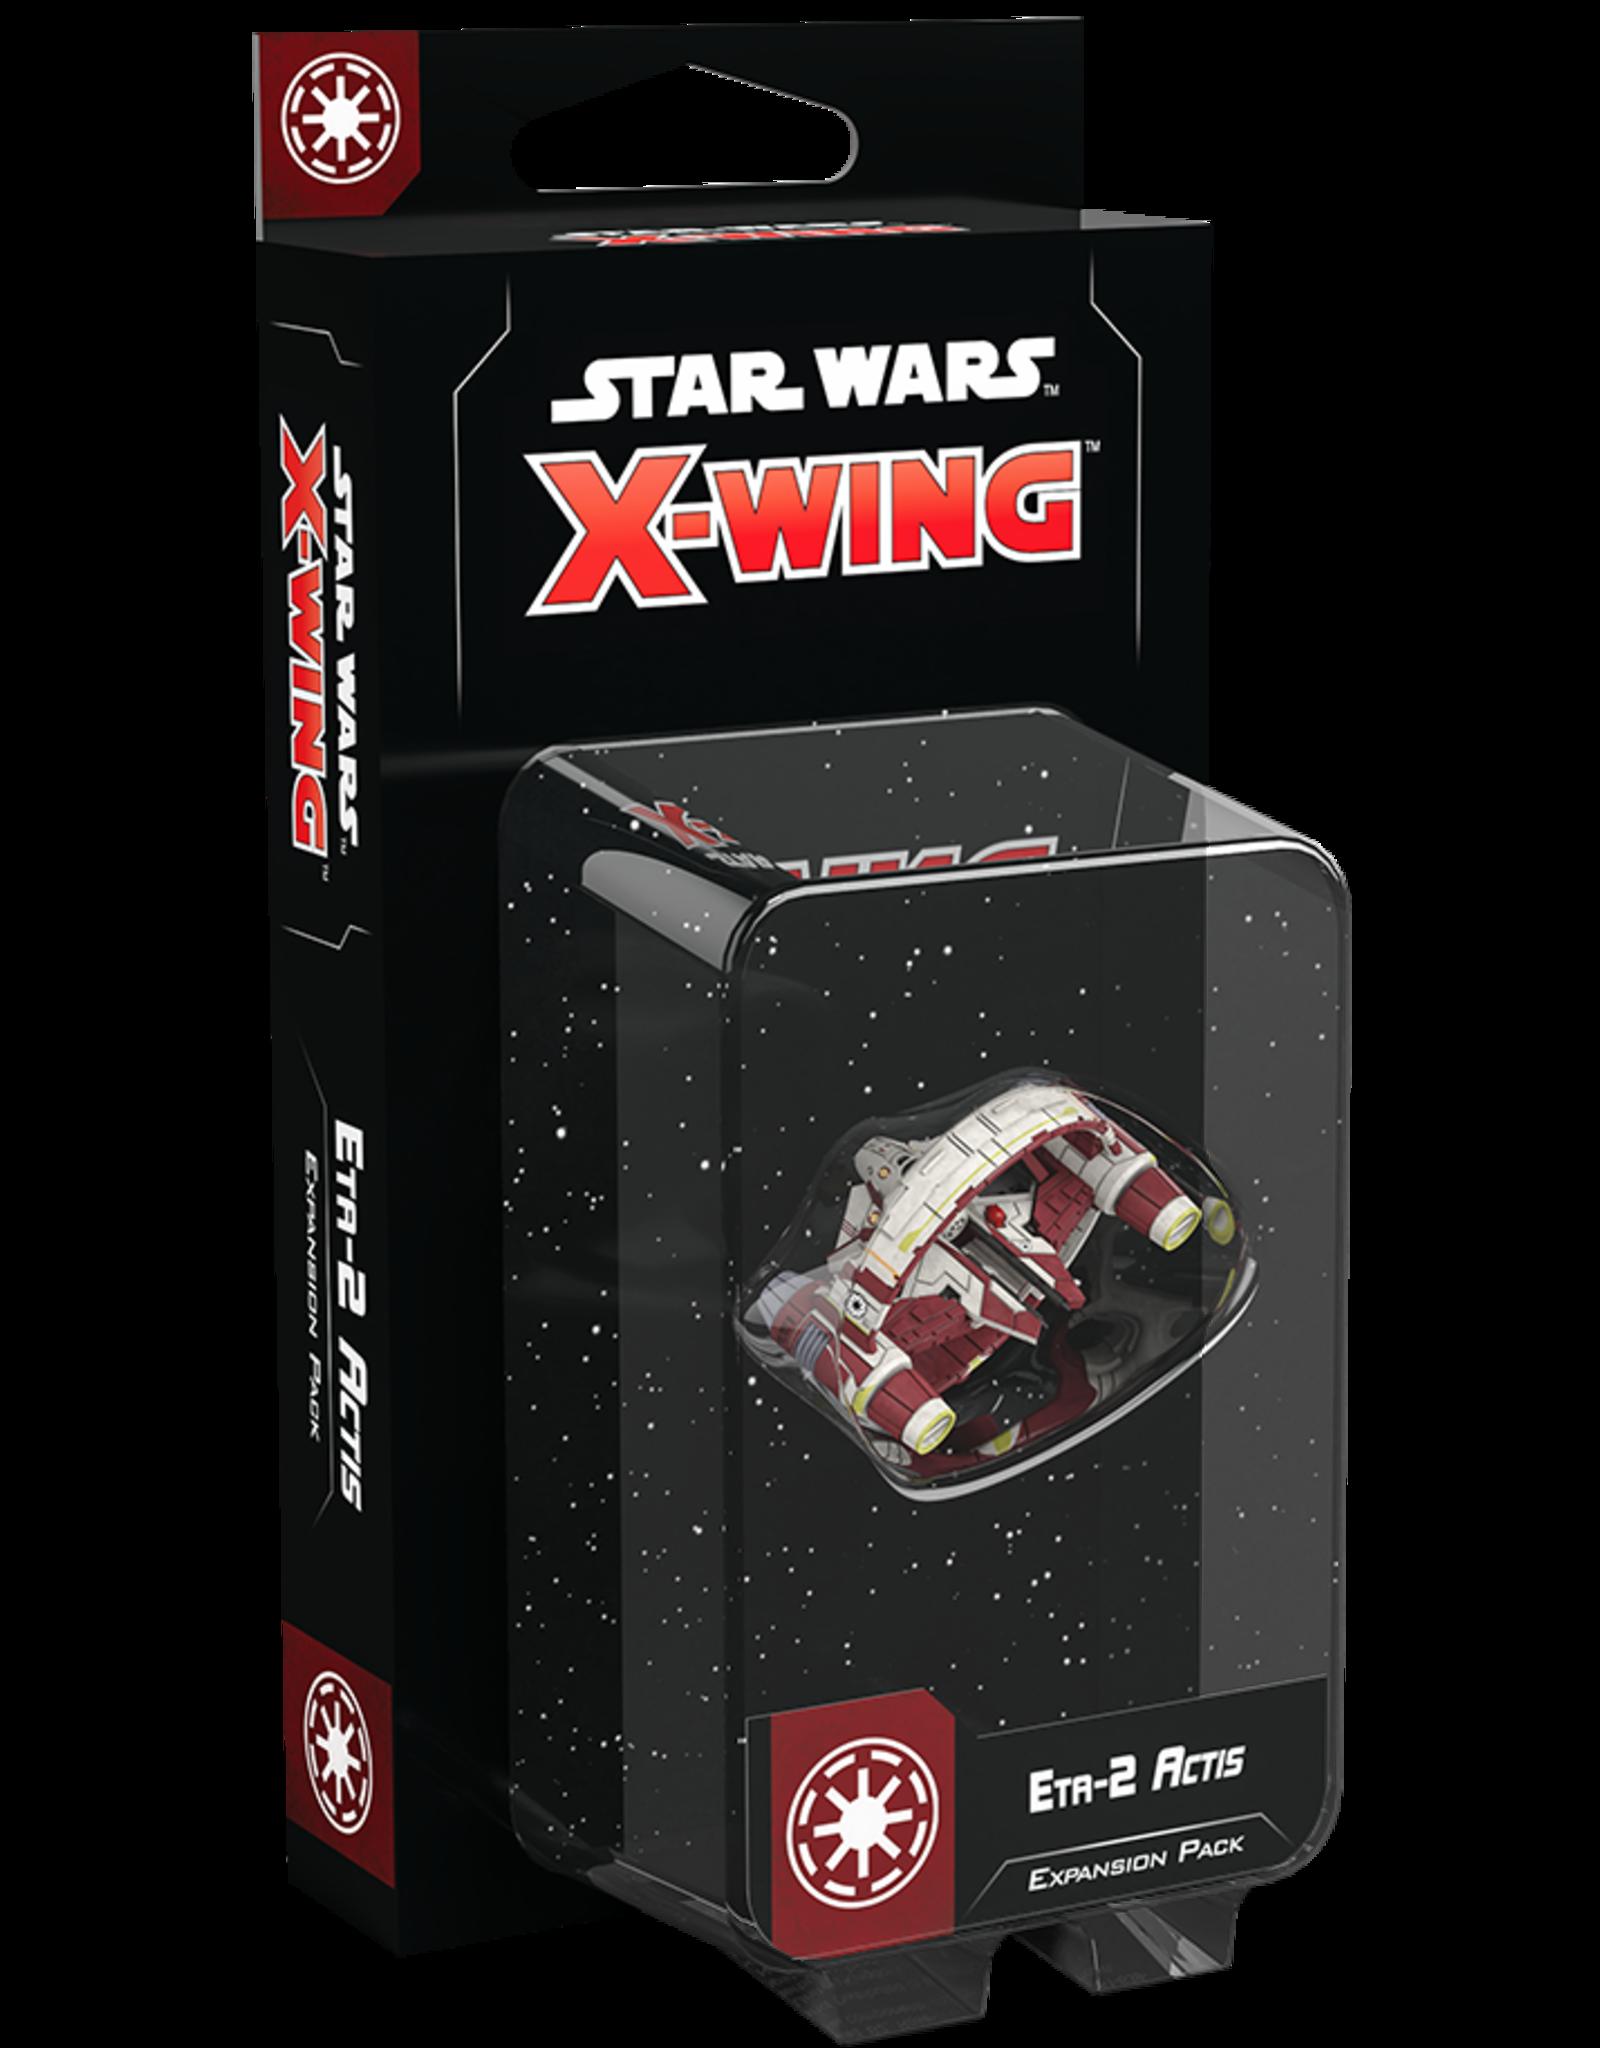 FANTASY FLIGHT GAMES STAR WARS X-WING 2ND ED: ETA-2 ACTIS